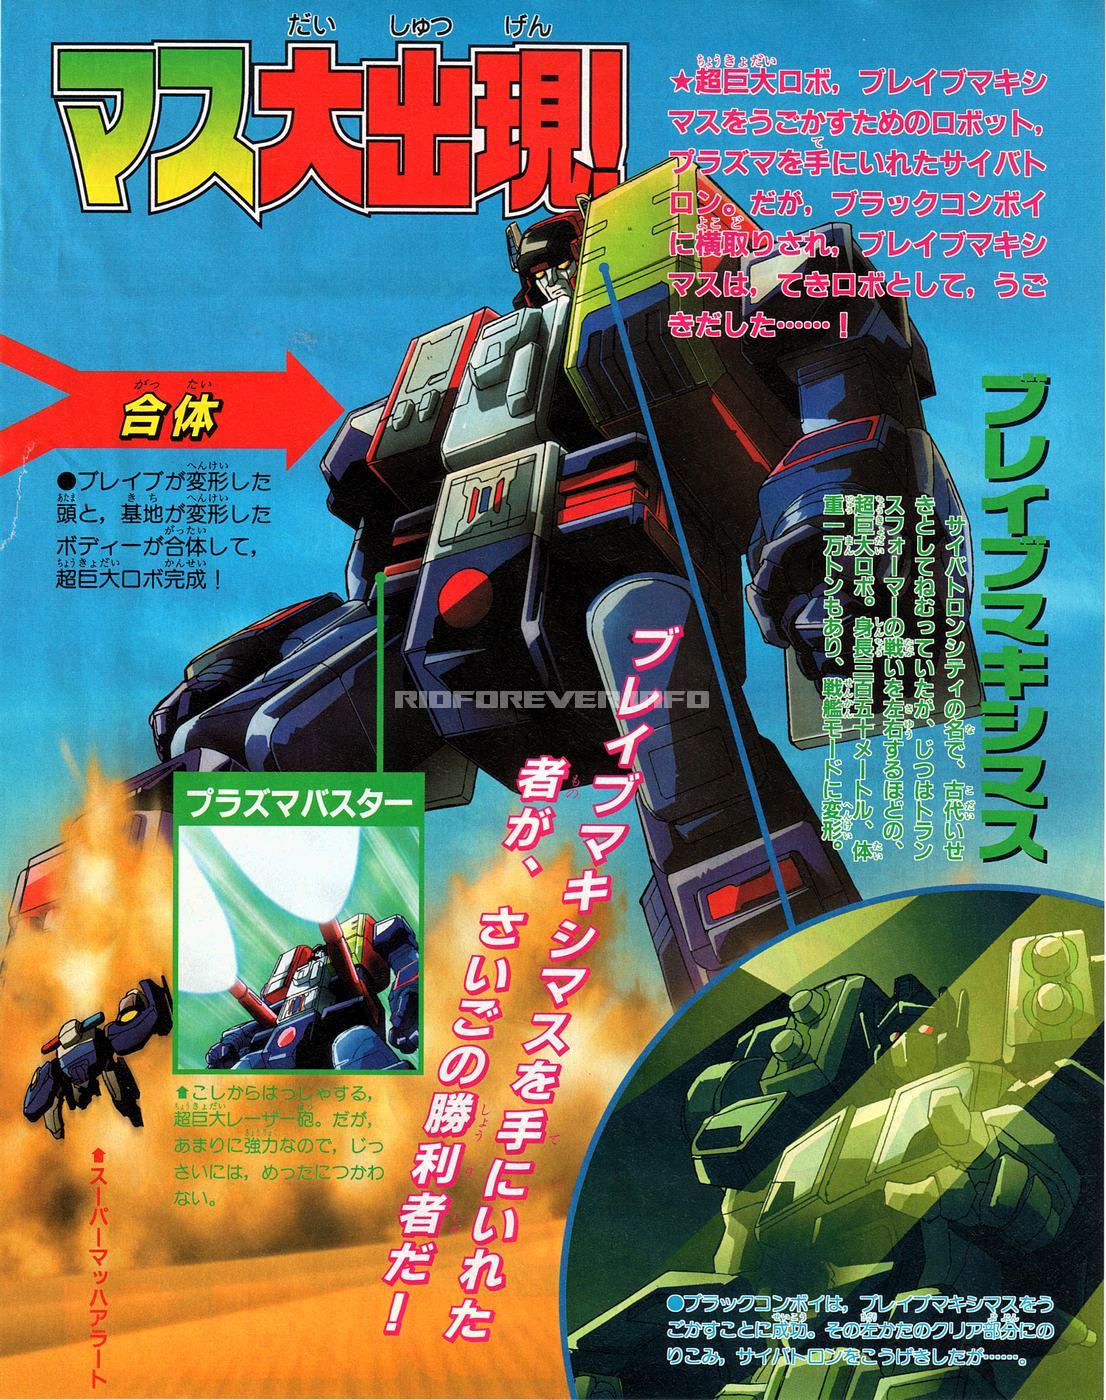 TV Magazine 2000-12-10-1